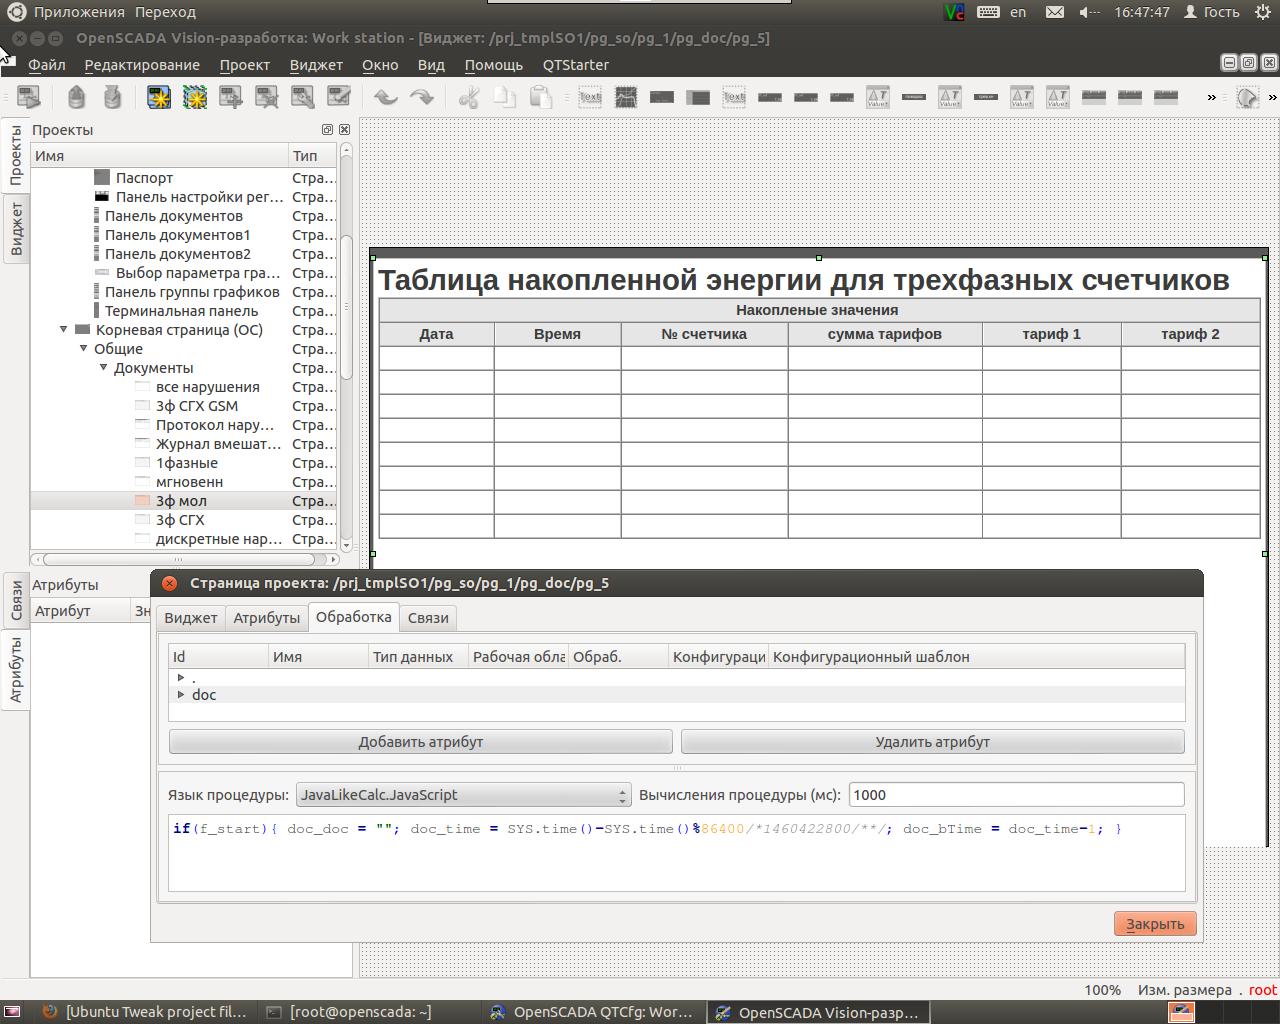 Пишем протоколы счетчиков Меркурий 230 и Меркурий 200 для OpenSCADA - 20